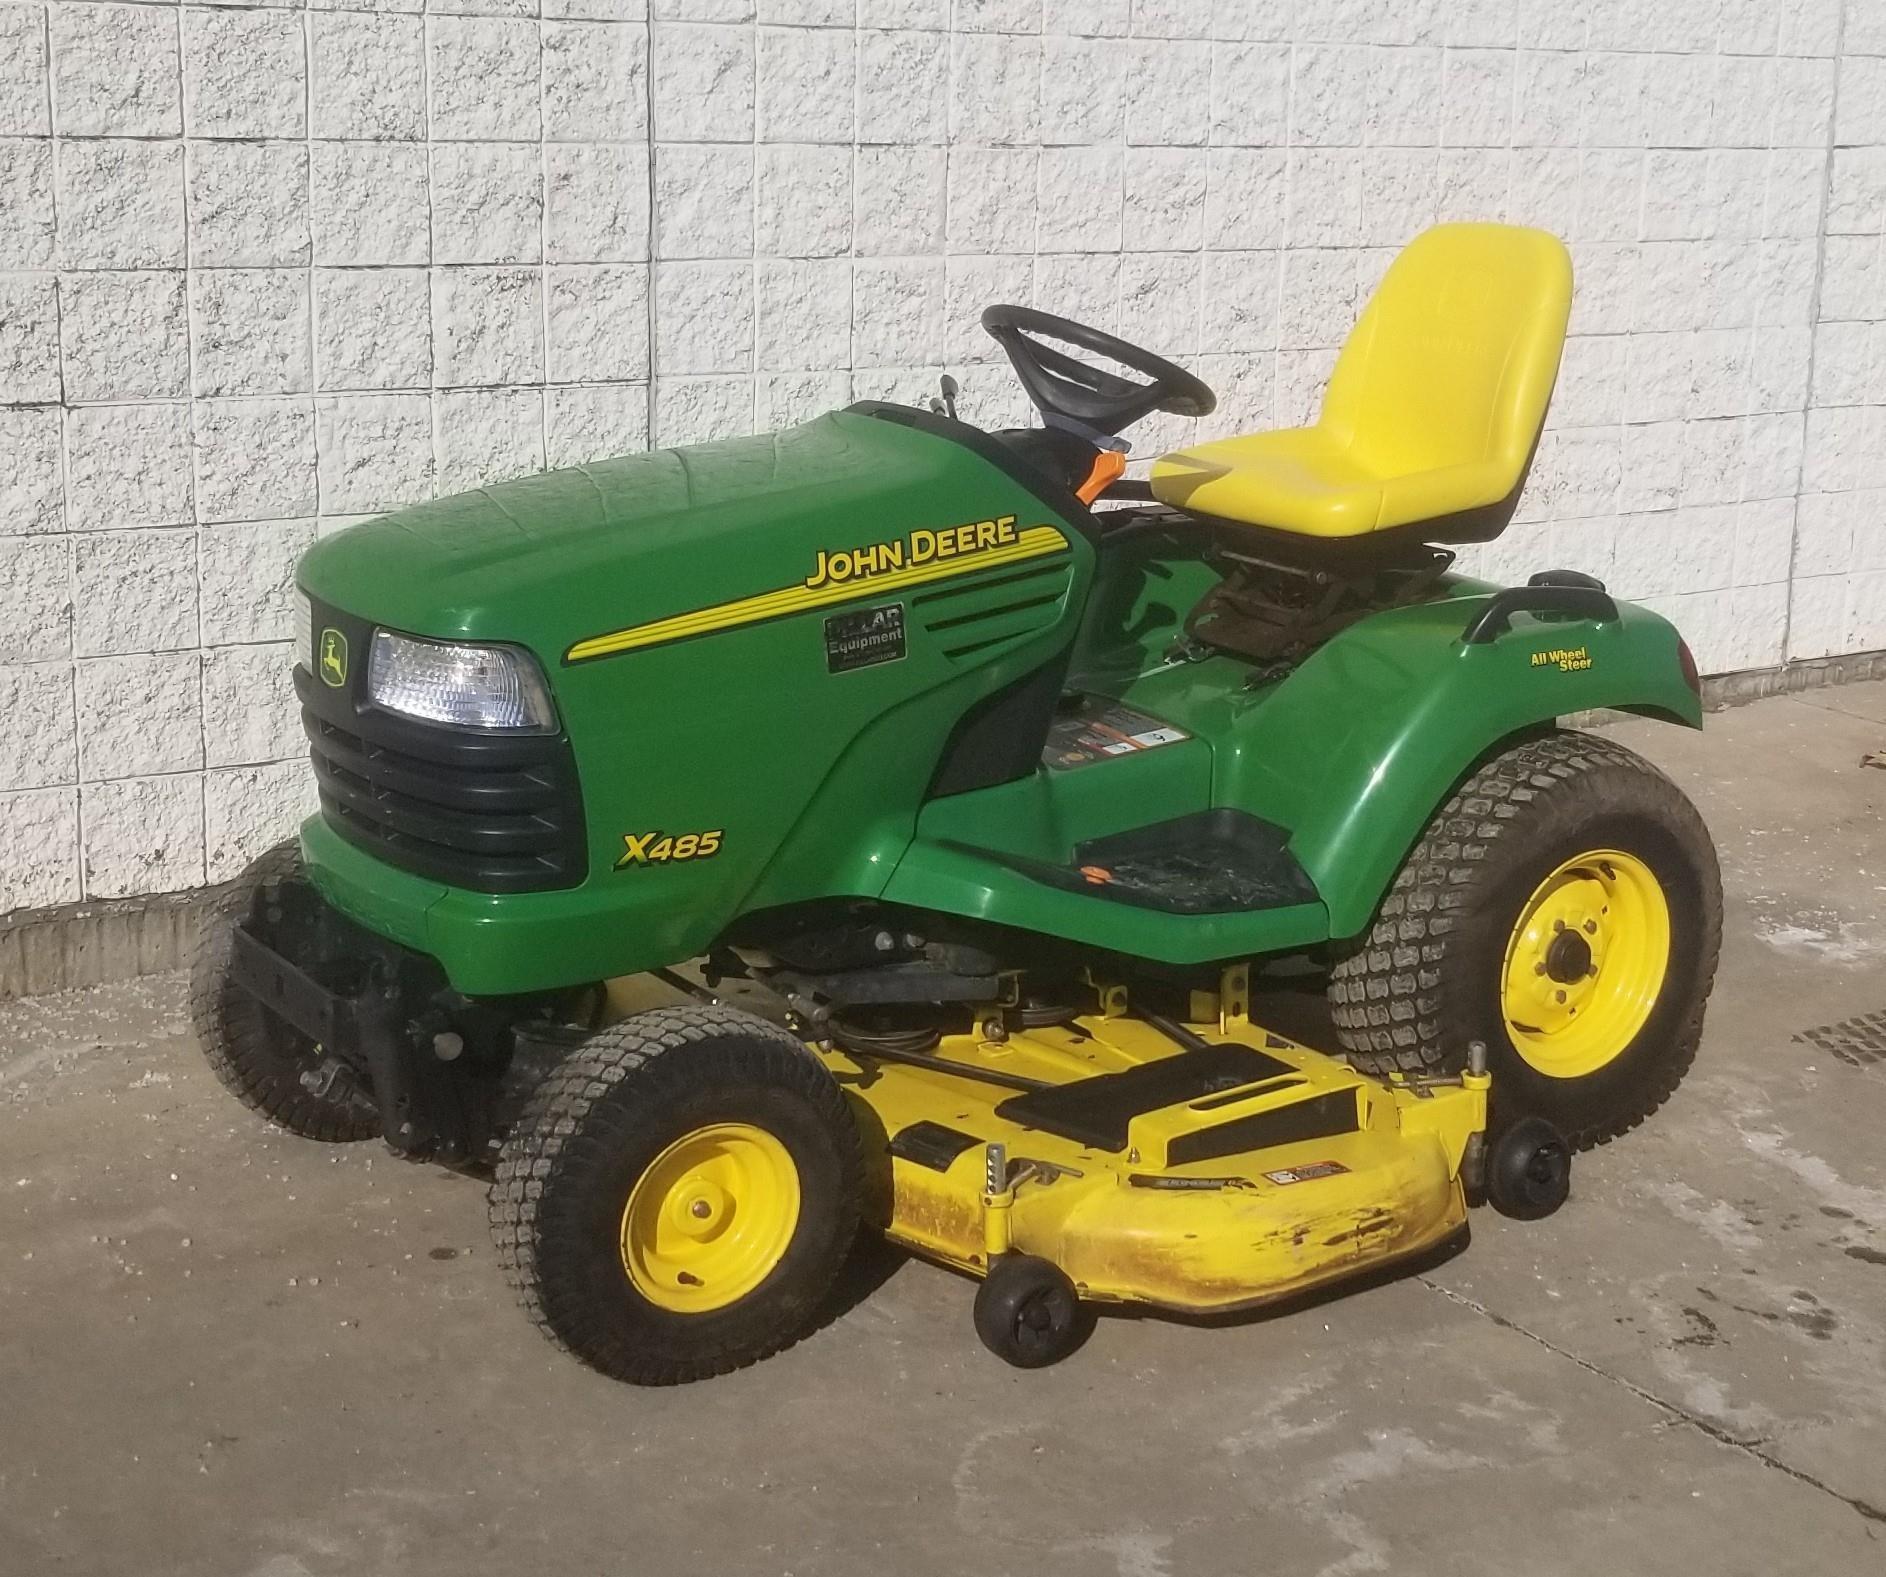 2005 John Deere X485 Lawn and Garden